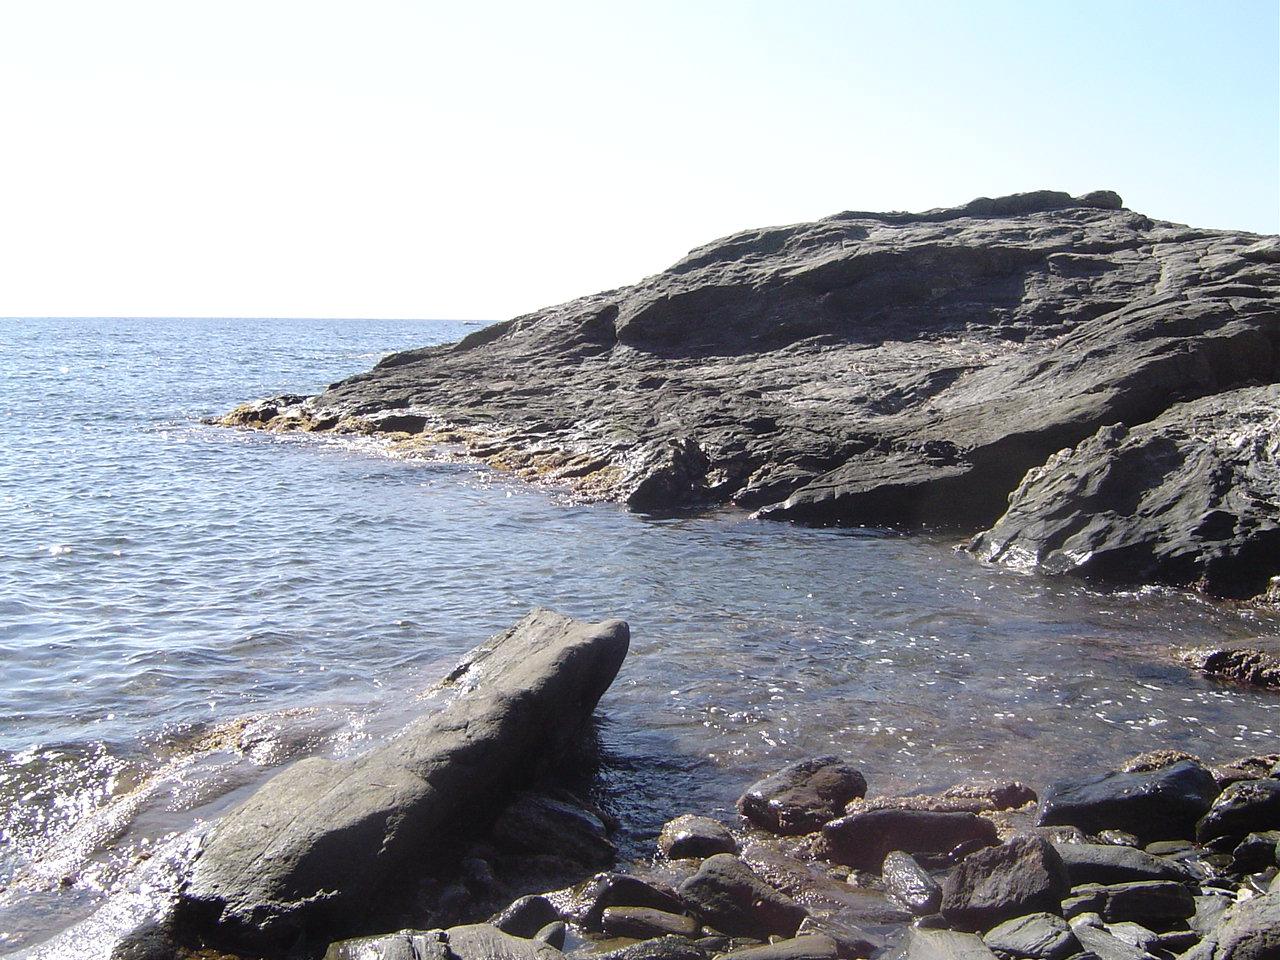 Foto playa Embarcadero Viejo. Cala solitaria